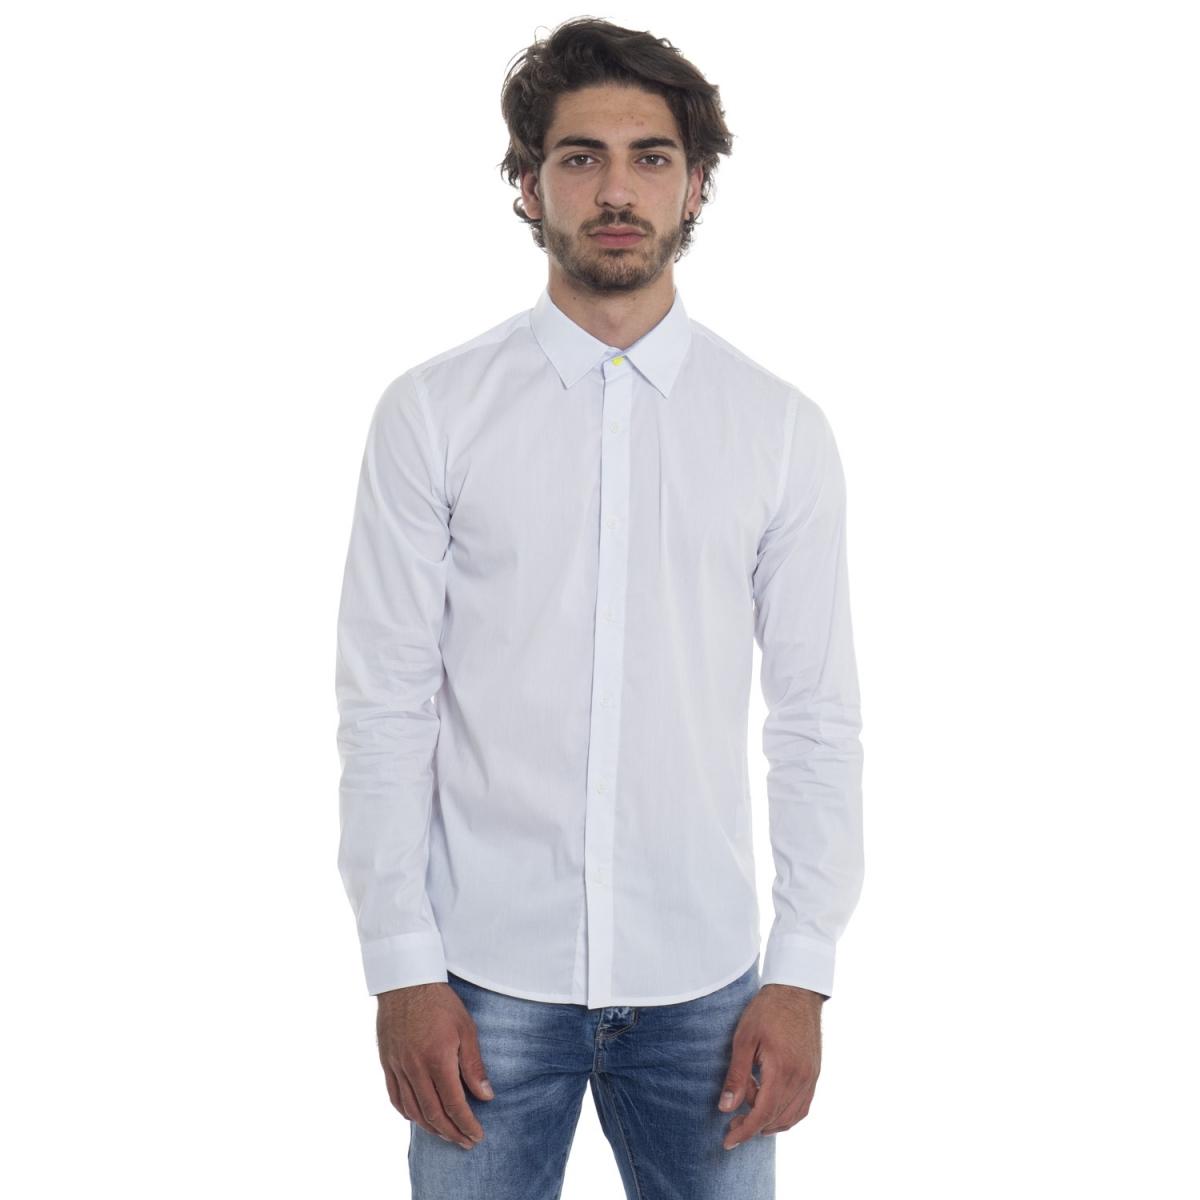 abbigliamento Camicie uomo Camicia slim fit LDX5608 LANDEK PARK Cafedelmar Shop